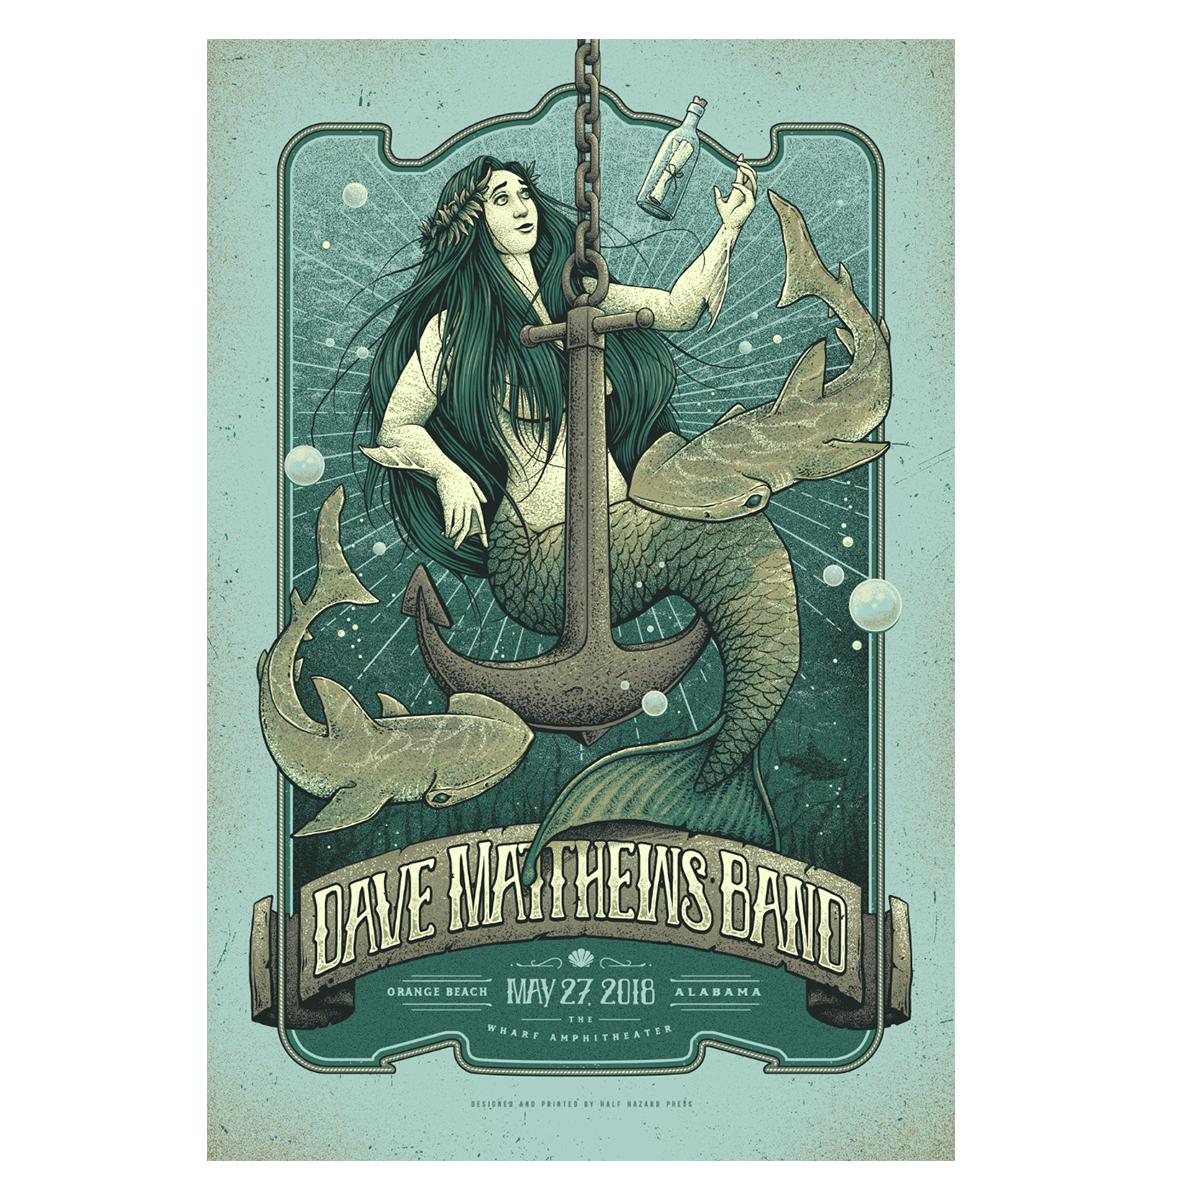 Dave Matthews Band Show Poster - Orange Beach, AL 5/27/2018